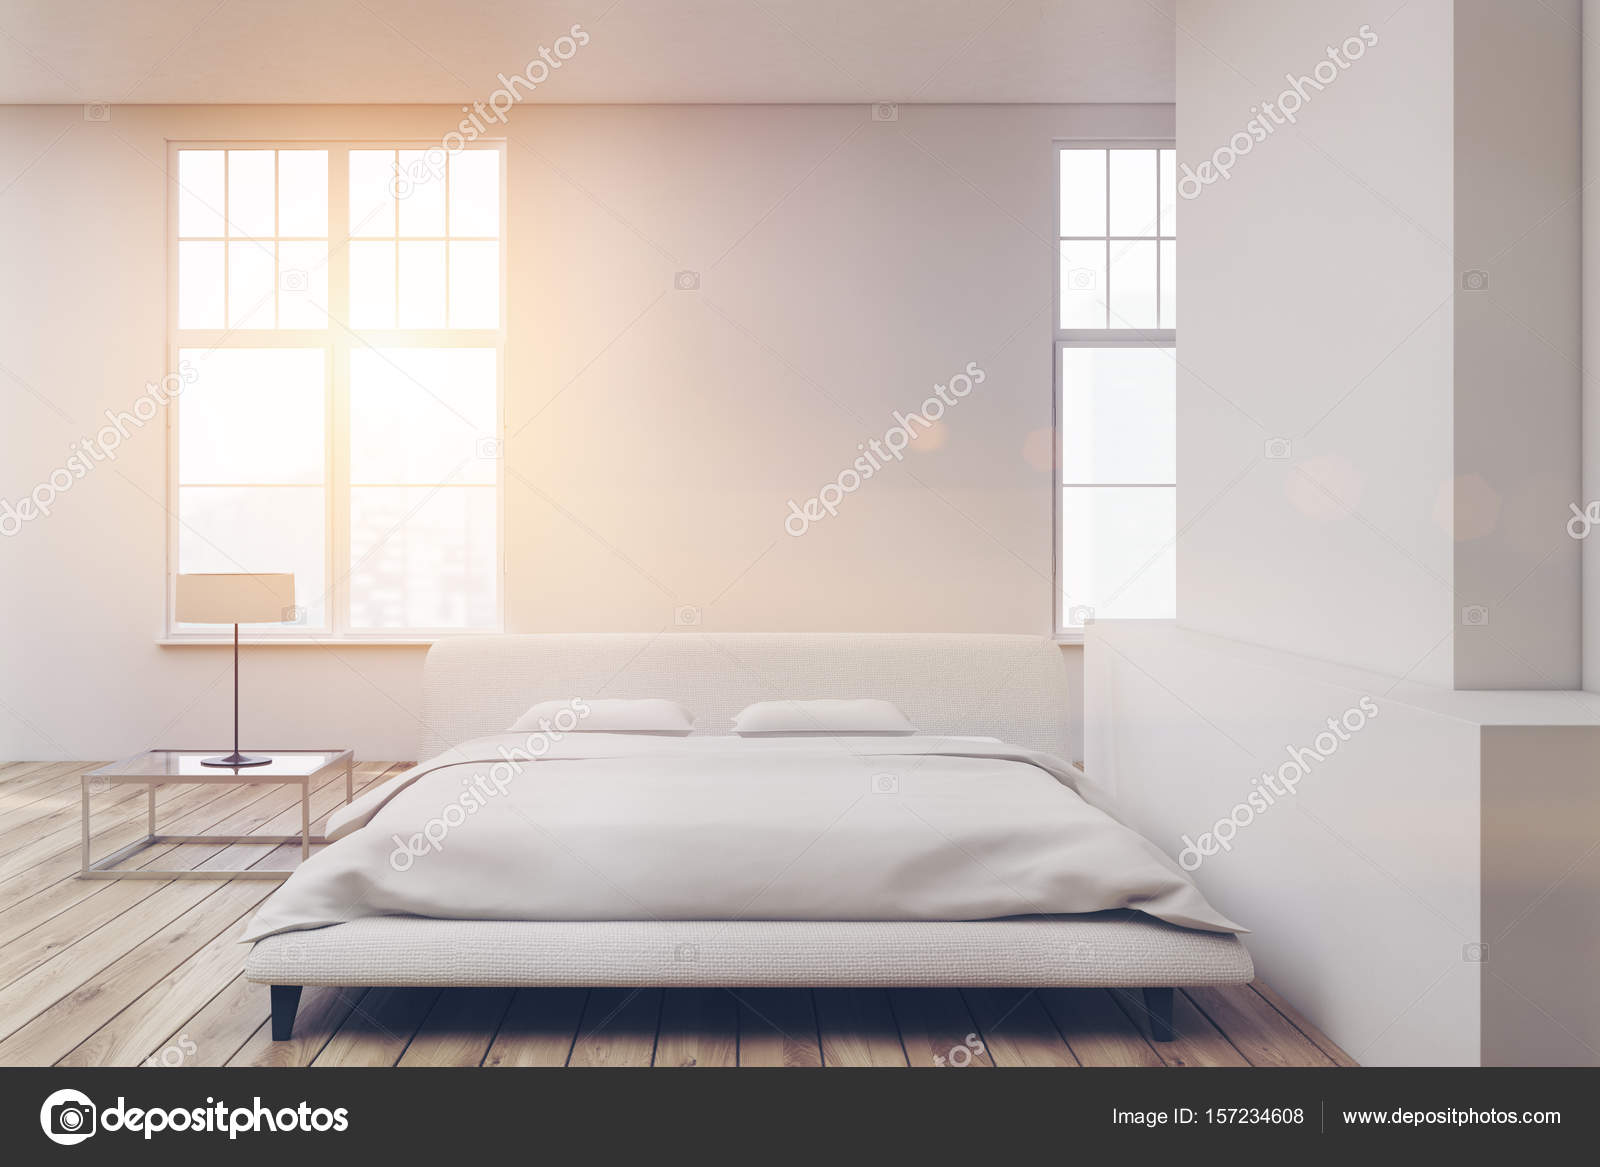 Houten vloer wit bed toned u2014 stockfoto © denisismagilov #157234608